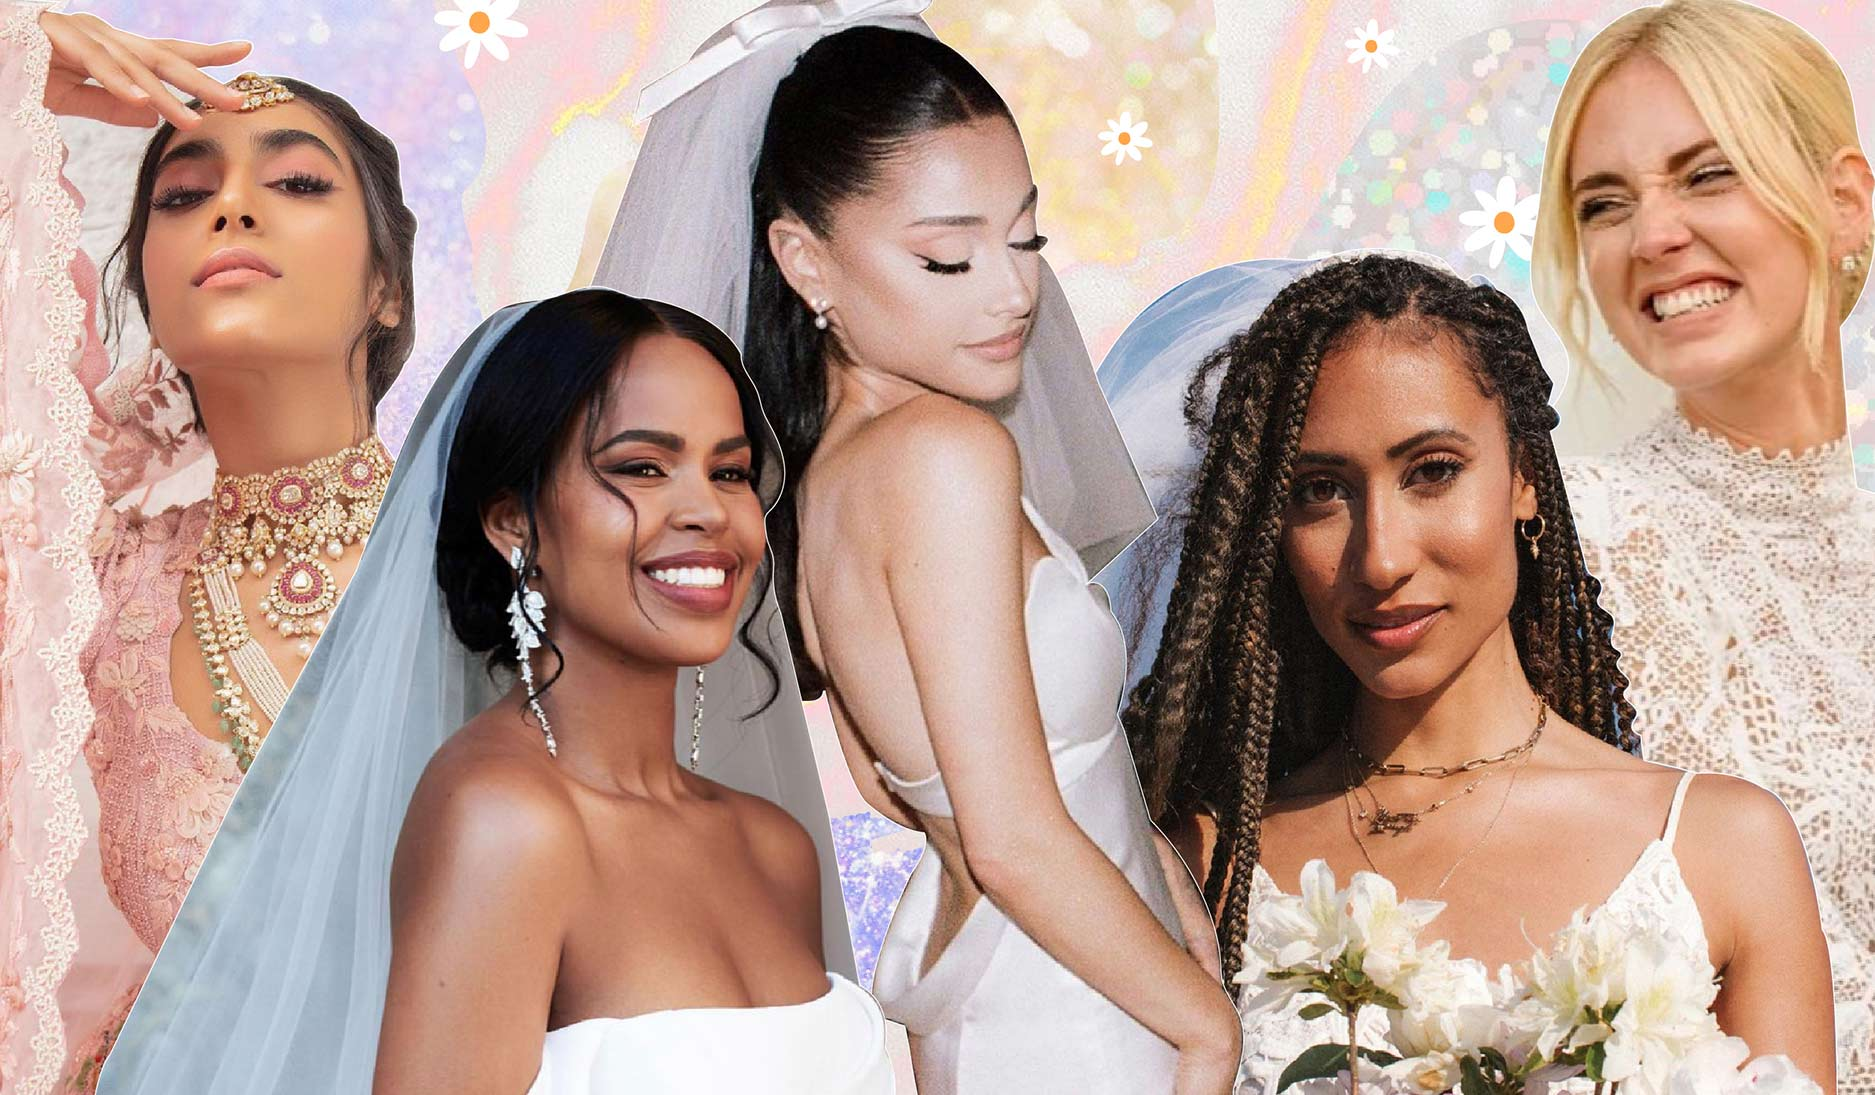 Celeb MUAs Reveal 15 Epic Wedding Day Makeup Tips